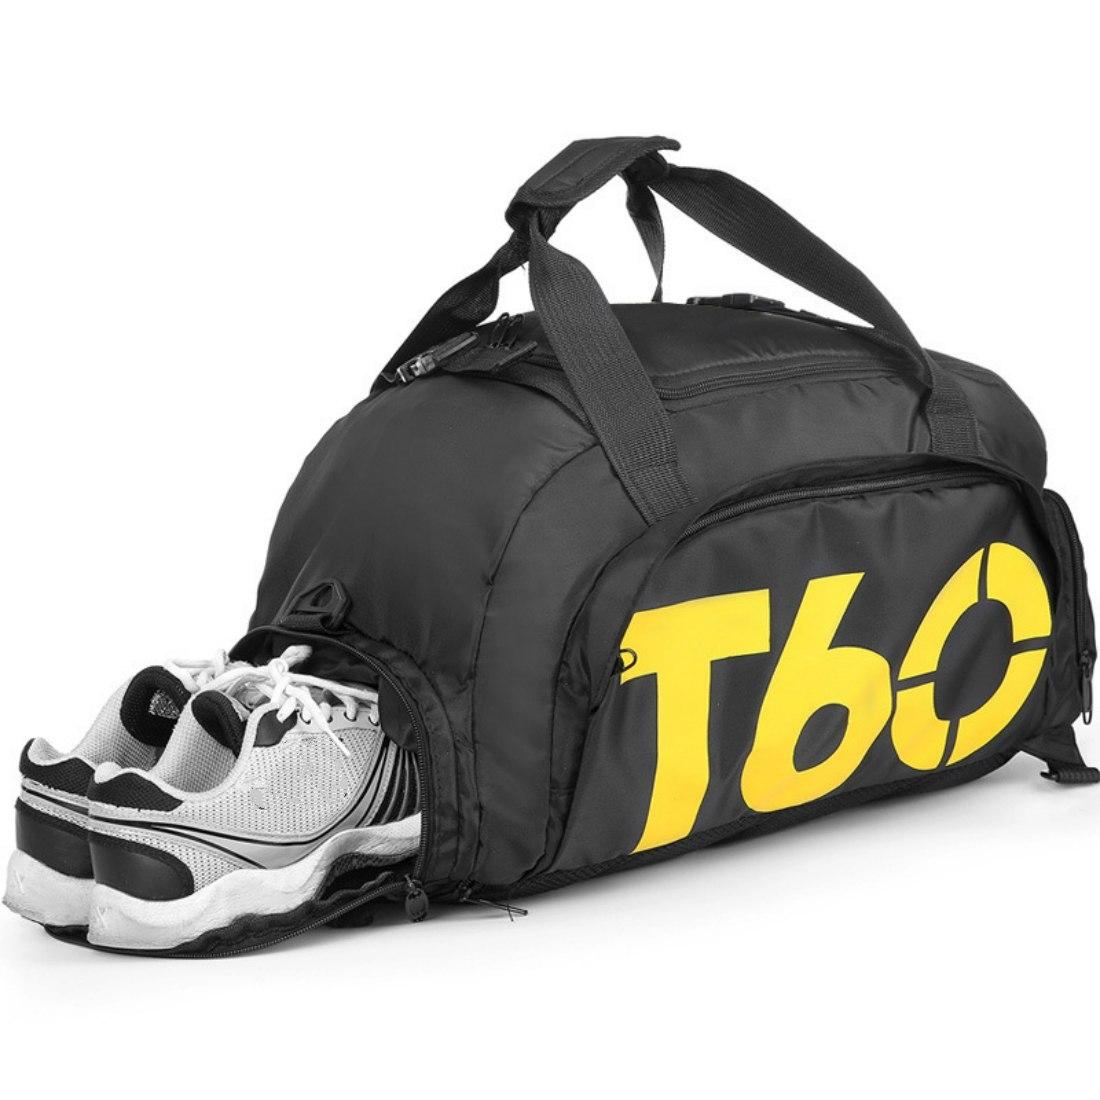 5fa15ef358bbf4 Fitness/trainer sporttas en rugzak in 1.